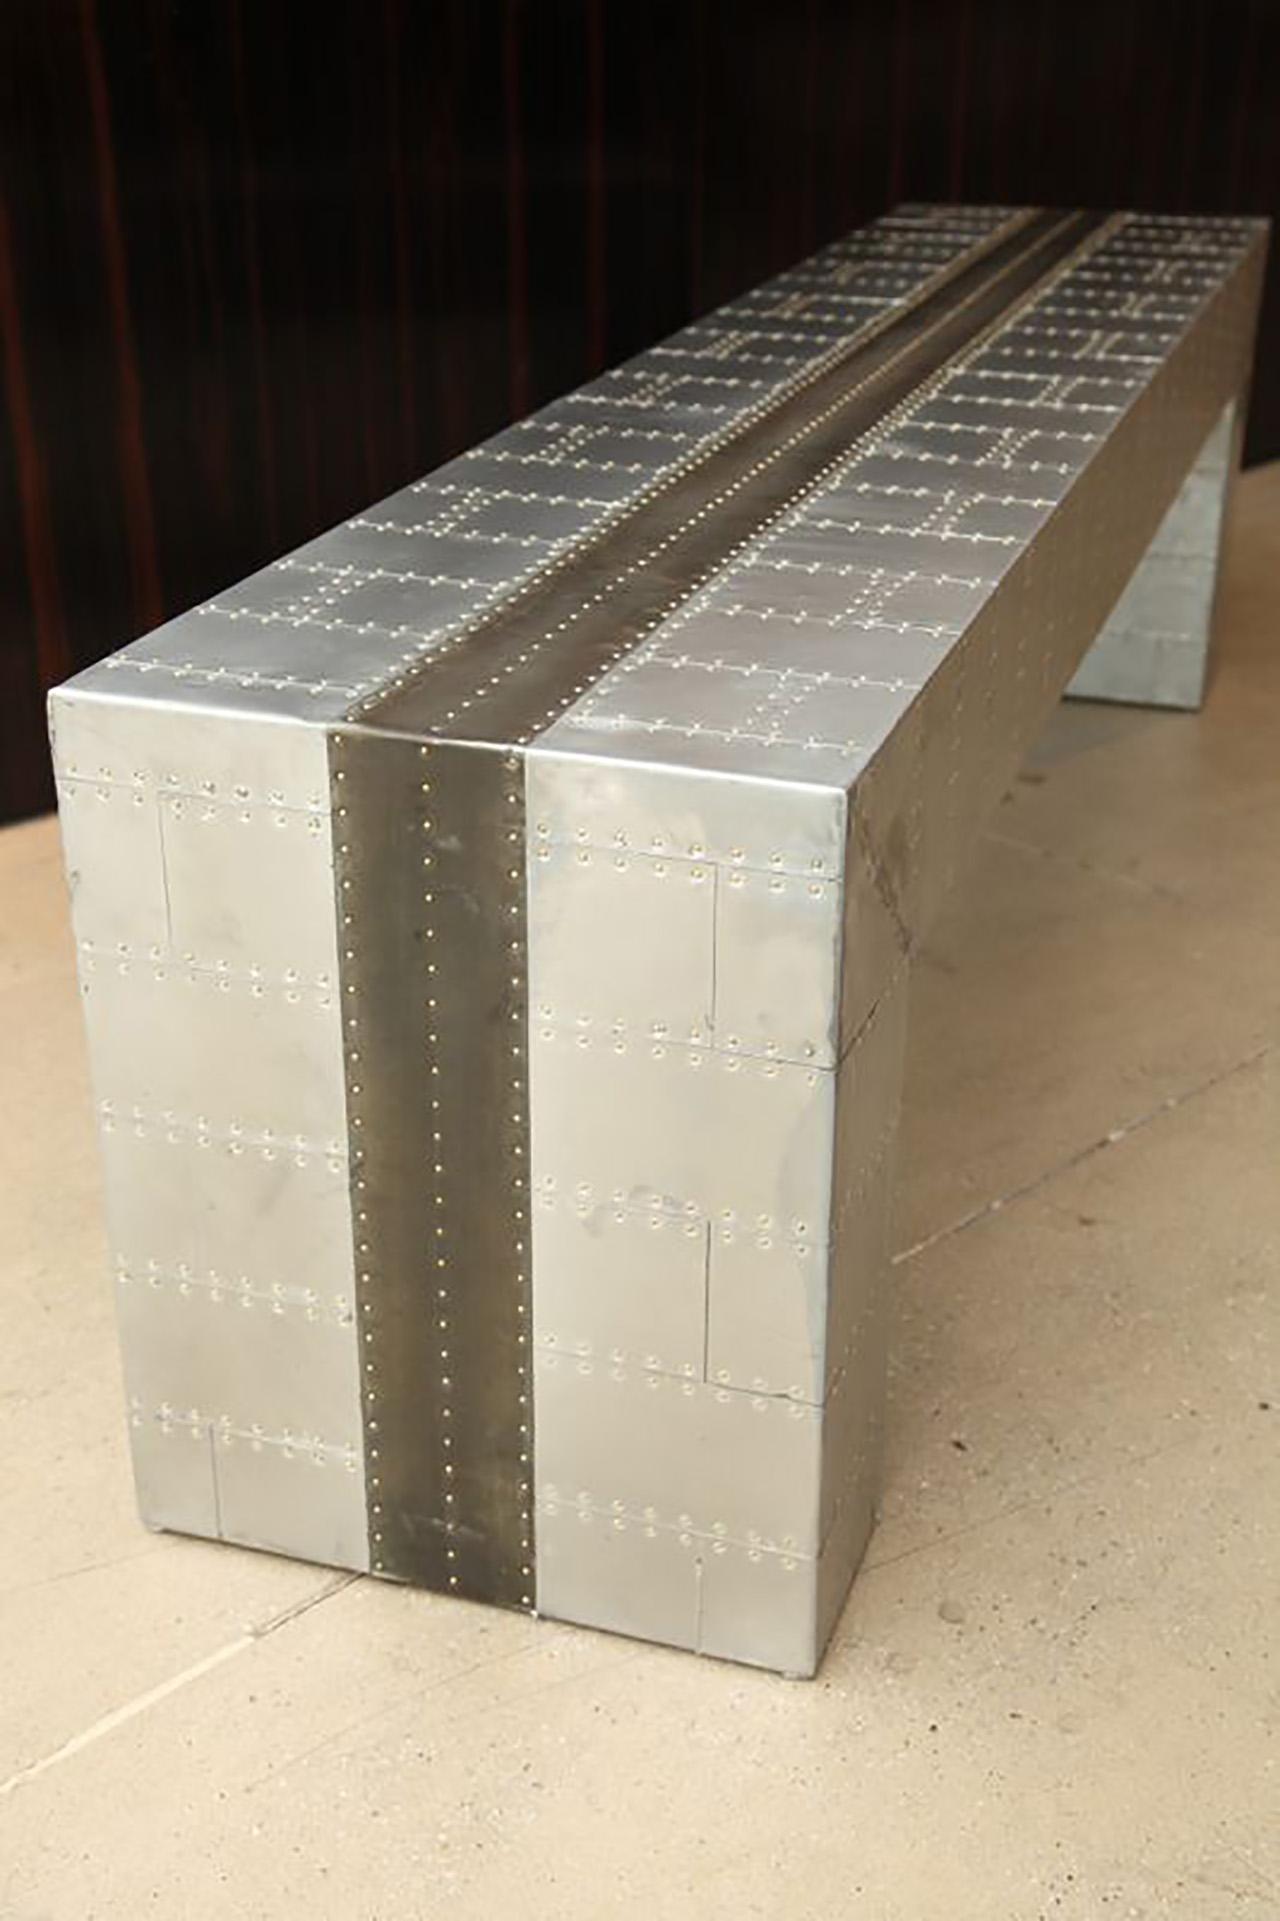 Sheet Zinc with Rivets Bench - La Bastille